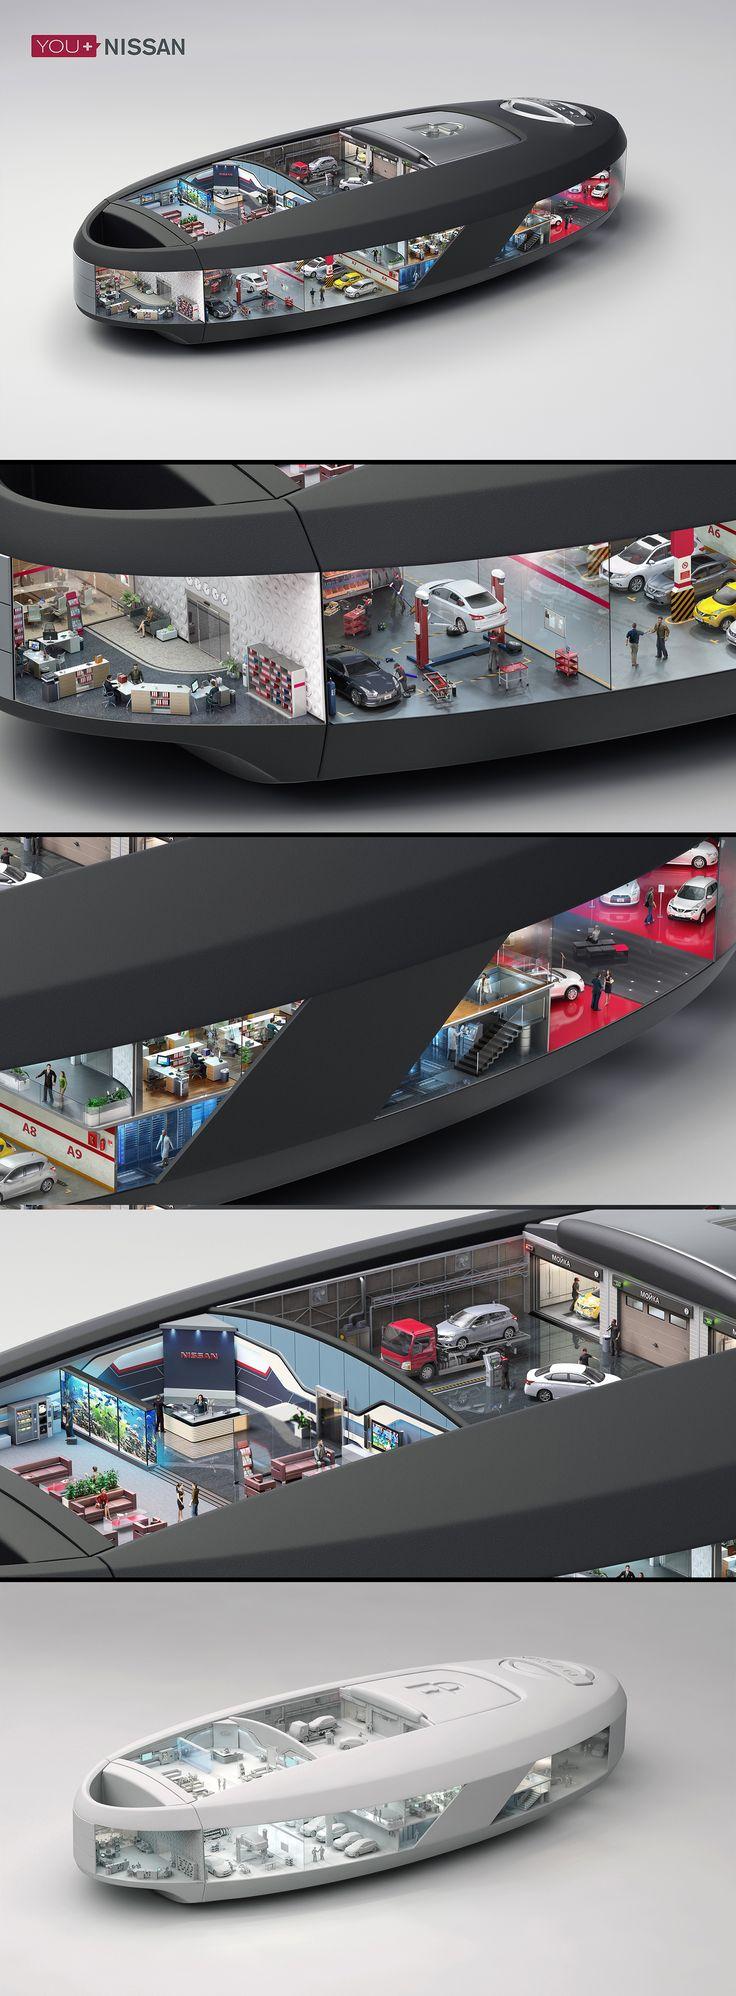 You+Nissan 3D-графика © Владимир Андреев